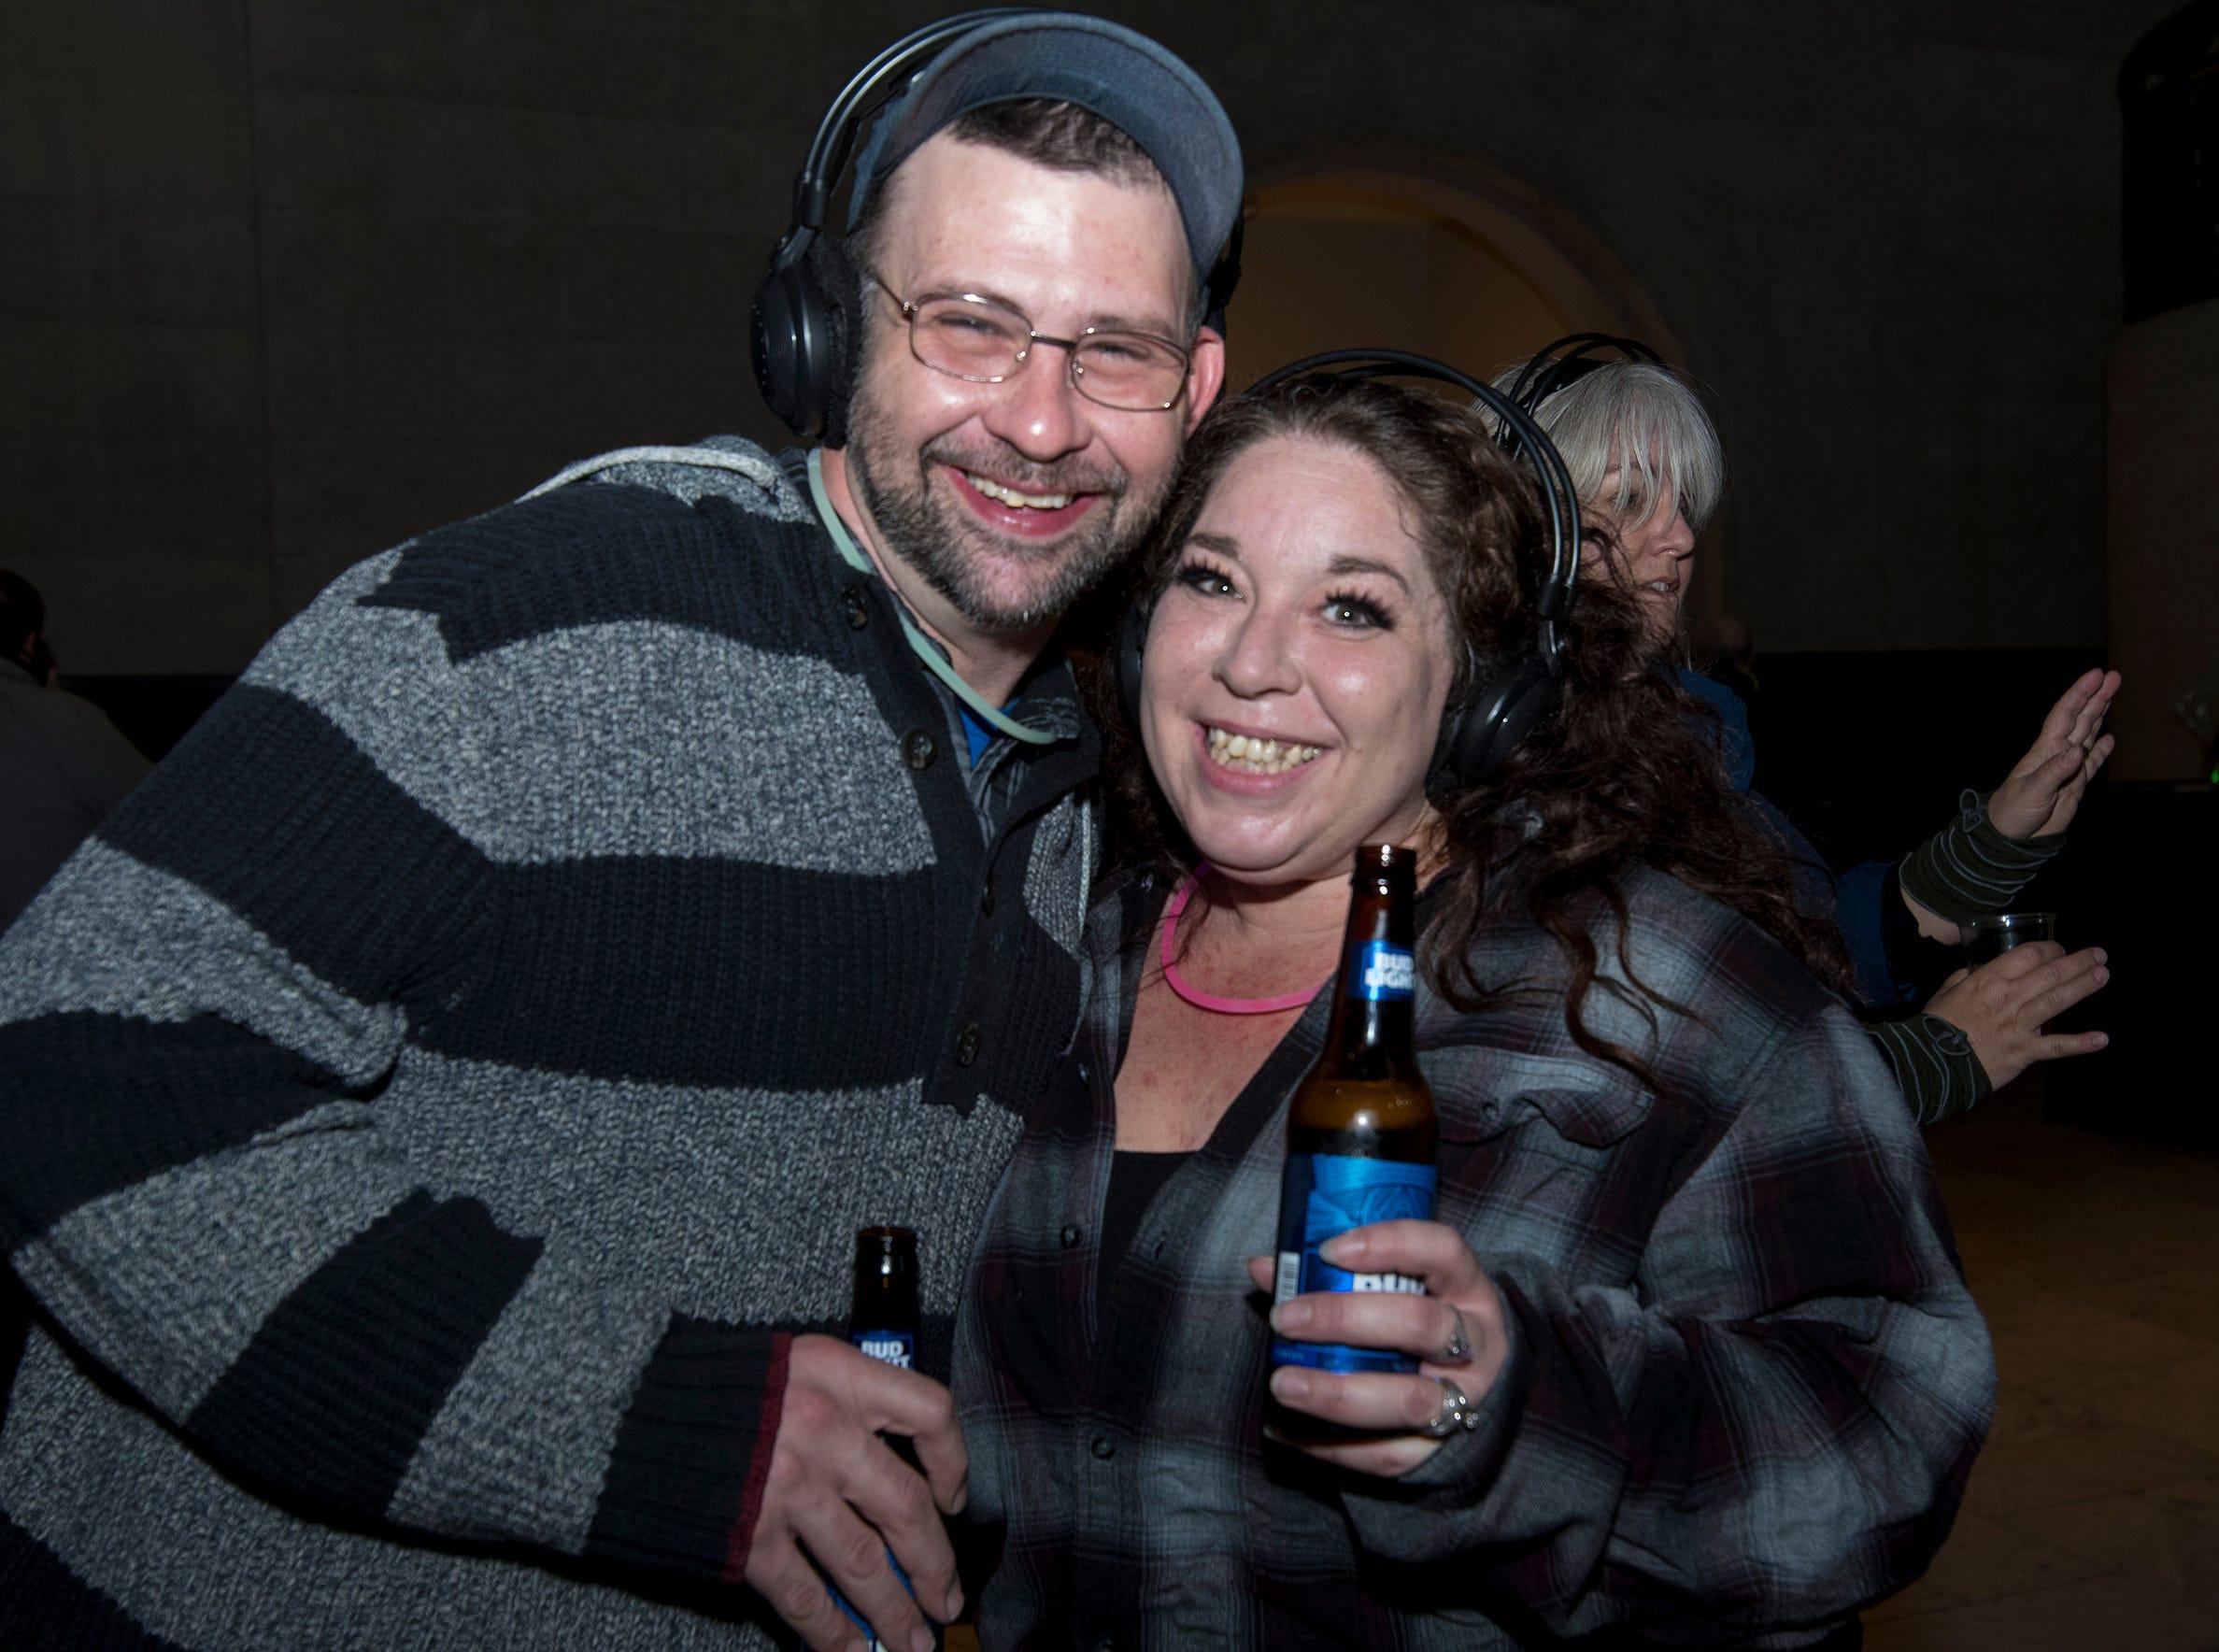 Darren and Jennifer Warman of Mt. Healthy attend a 90s-themed silent disco during Art After Dark at the Cincinnati Art Museum Friday, January 25, 2019 in Cincinnati, Ohio.